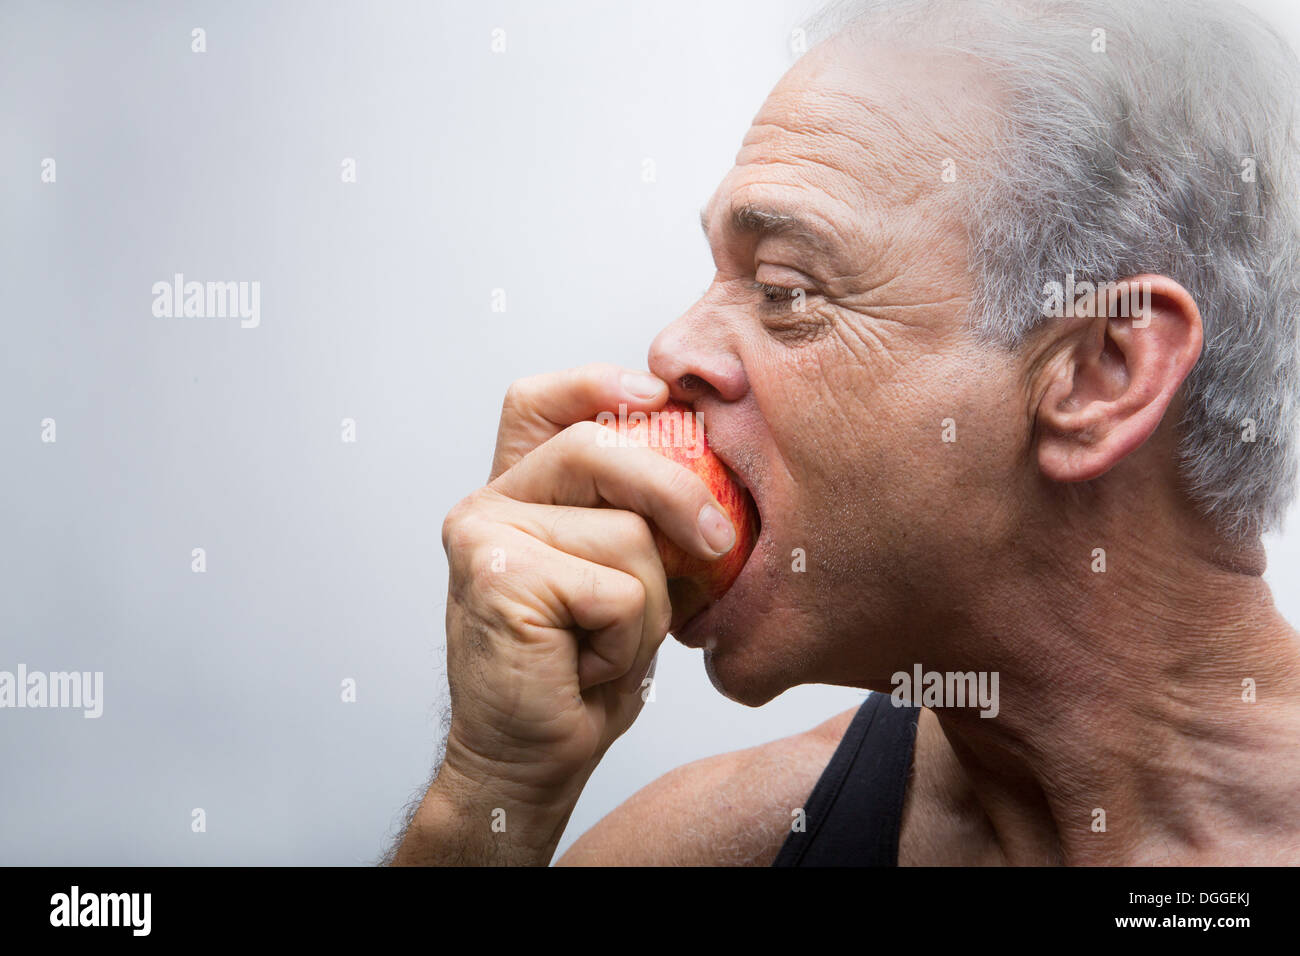 Ältere Menschen essen Apfel, Nahaufnahme Stockbild